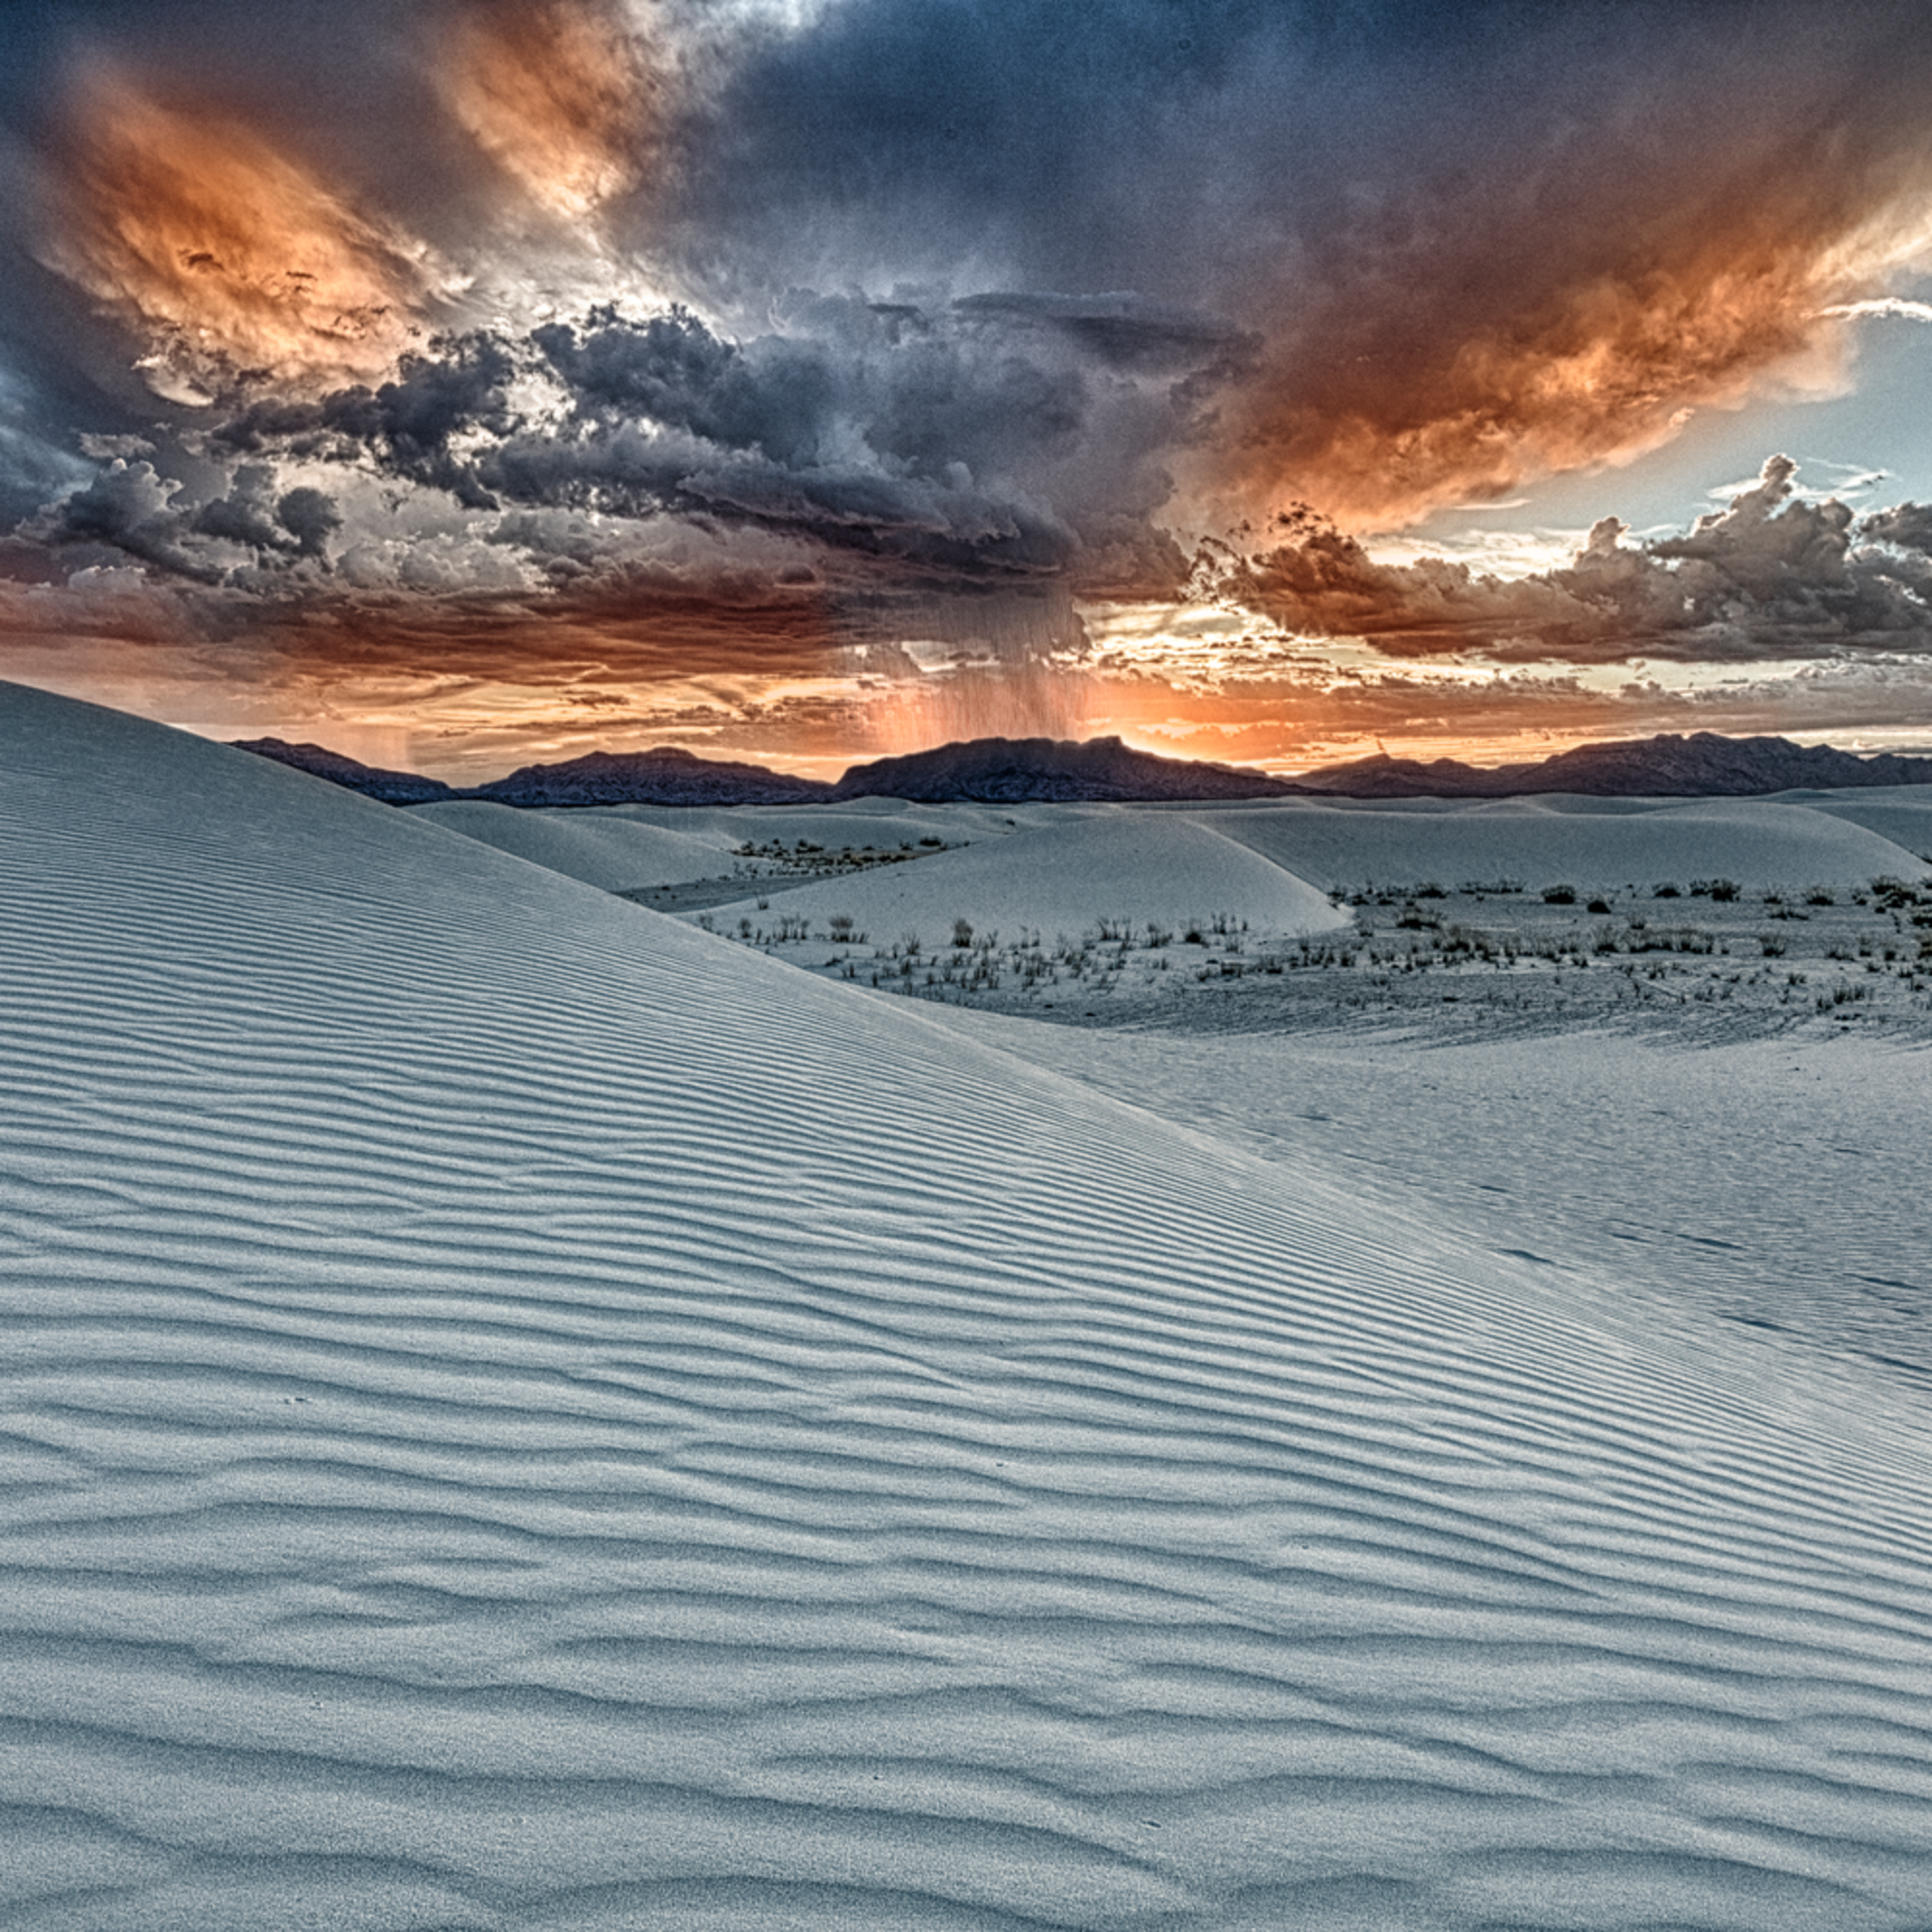 Mcjensen 5dsr white sands sept 09182015 h9a9839 hdr edit print master edit vzqh9z